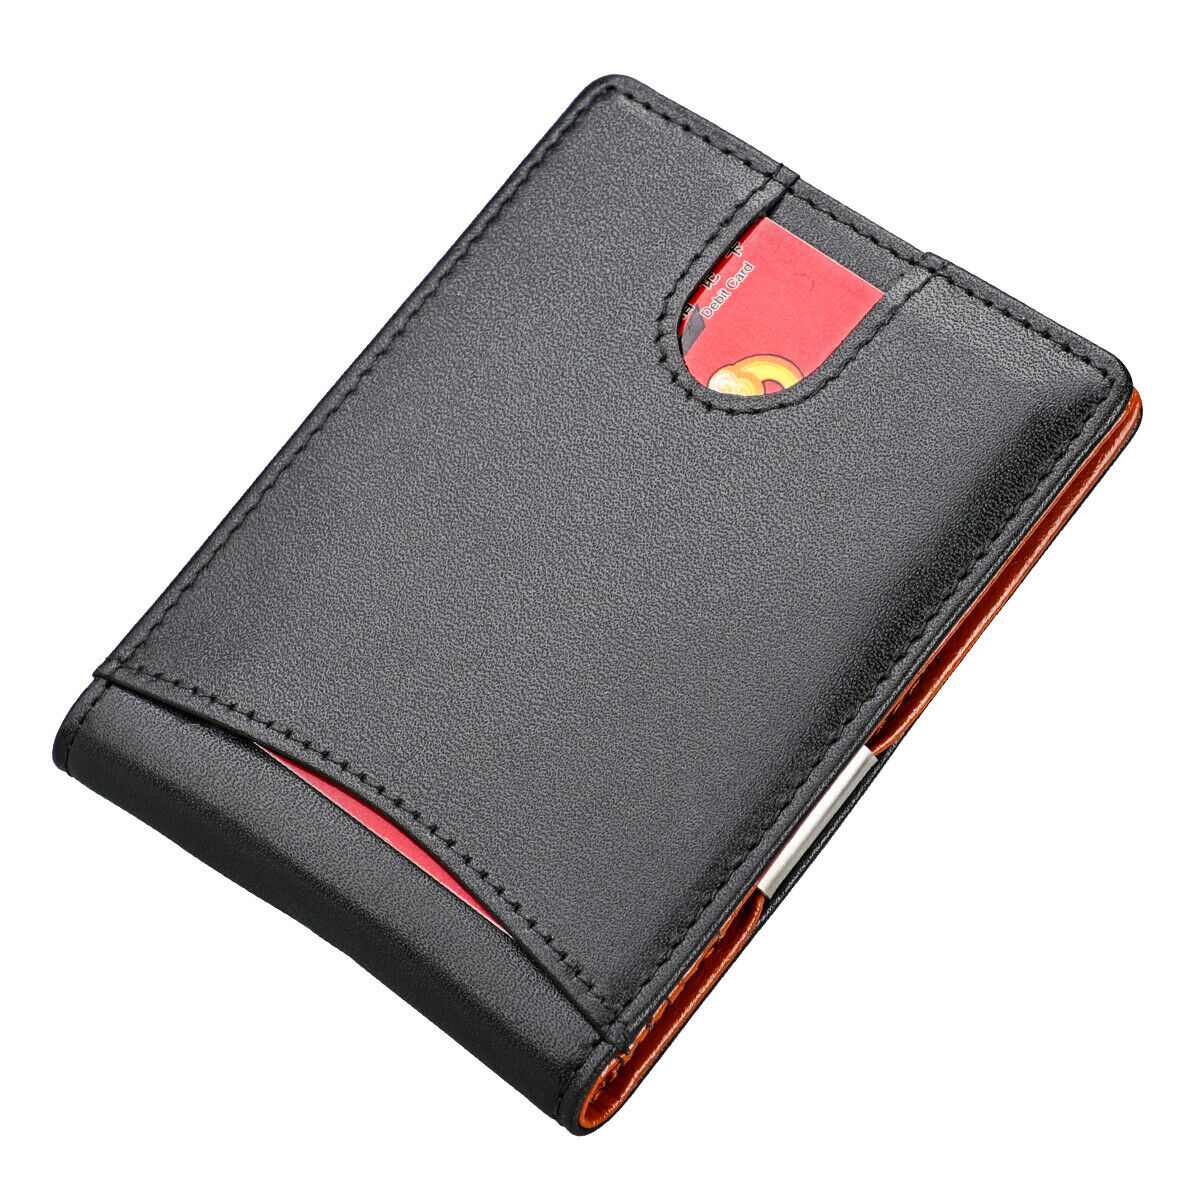 Slim Money Clip Bifold Wallet for Men Genuine Leather Front Pocket Card Holder Clothing, Shoes & Accessories